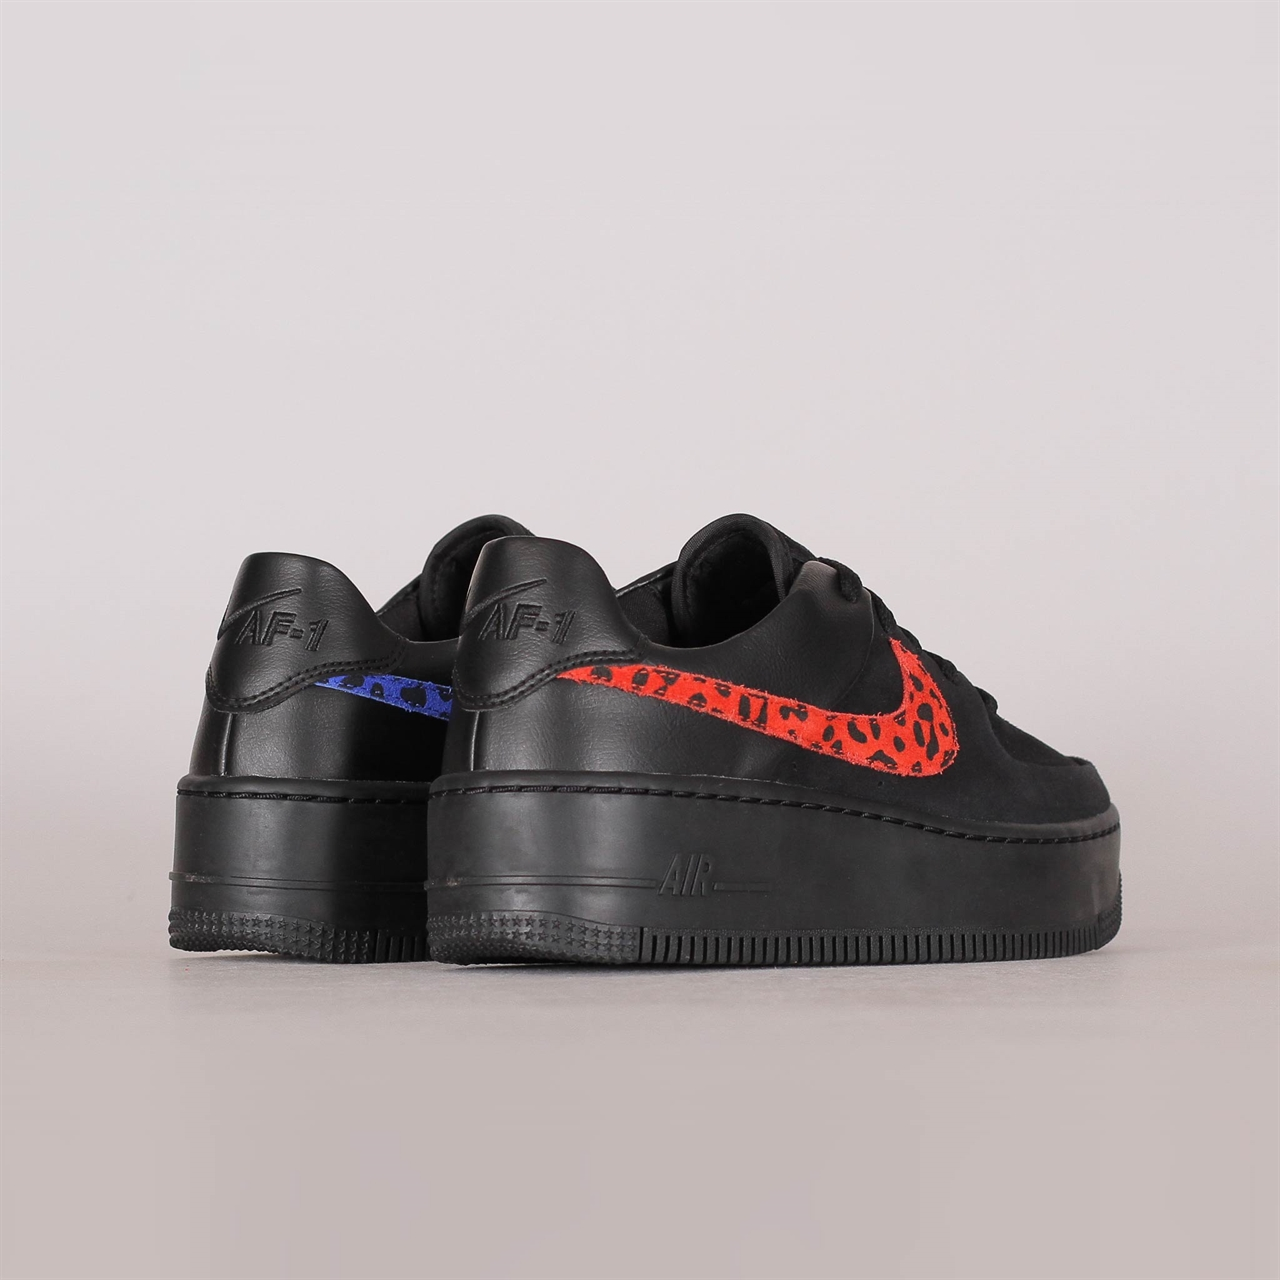 sports shoes 451af 17bee Womens Air Force 1 Sage Lo Premium Black Leopard (BV1979-001)